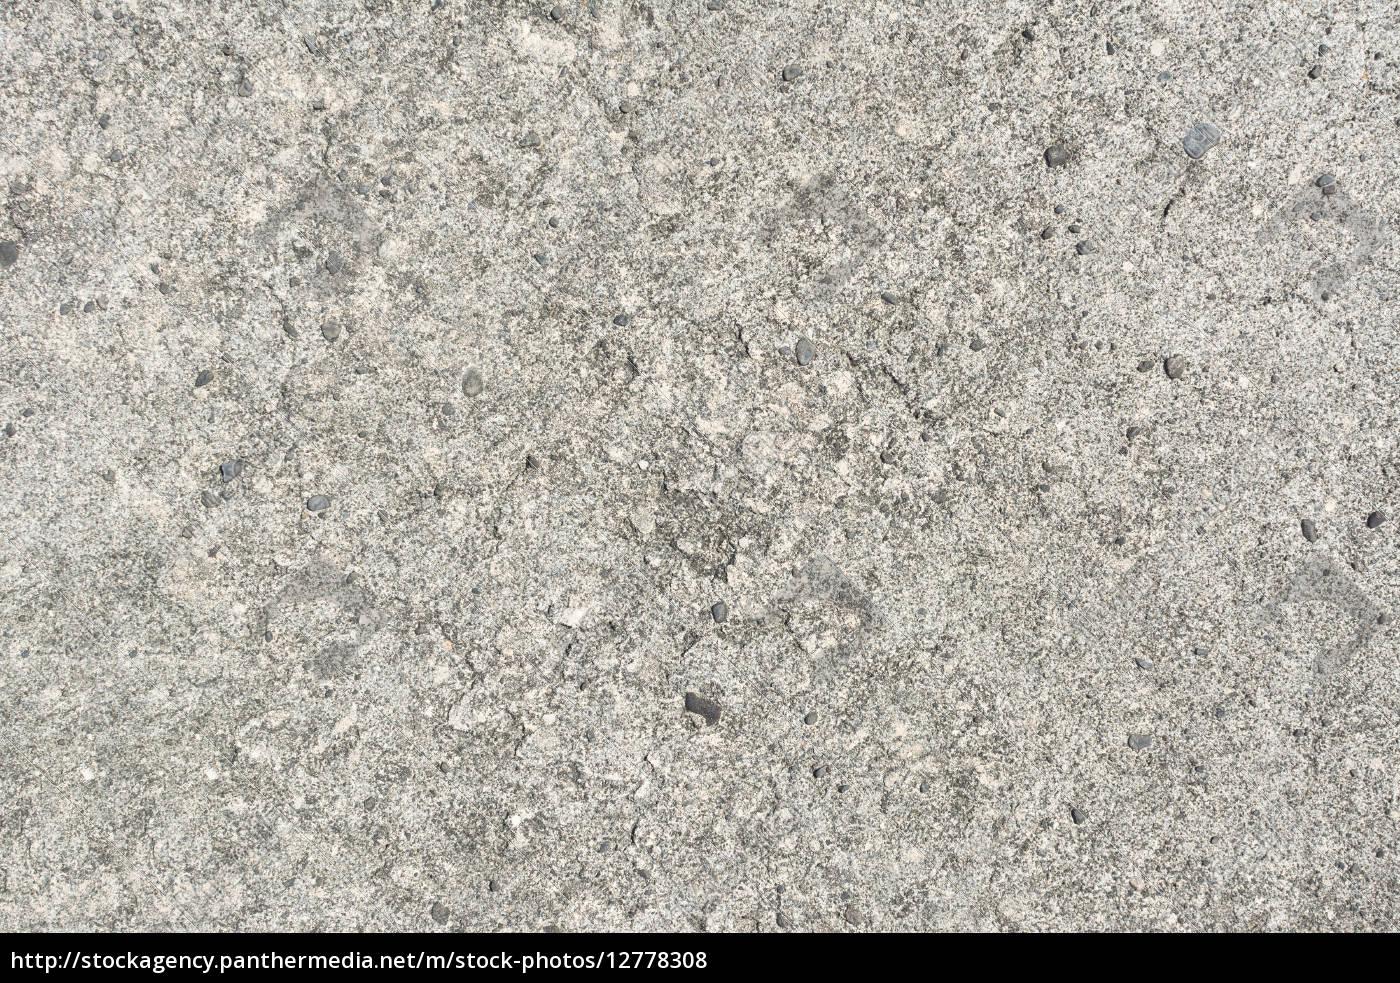 zement wand hintergrund lizenzfreies foto 12778308 bildagentur panthermedia. Black Bedroom Furniture Sets. Home Design Ideas